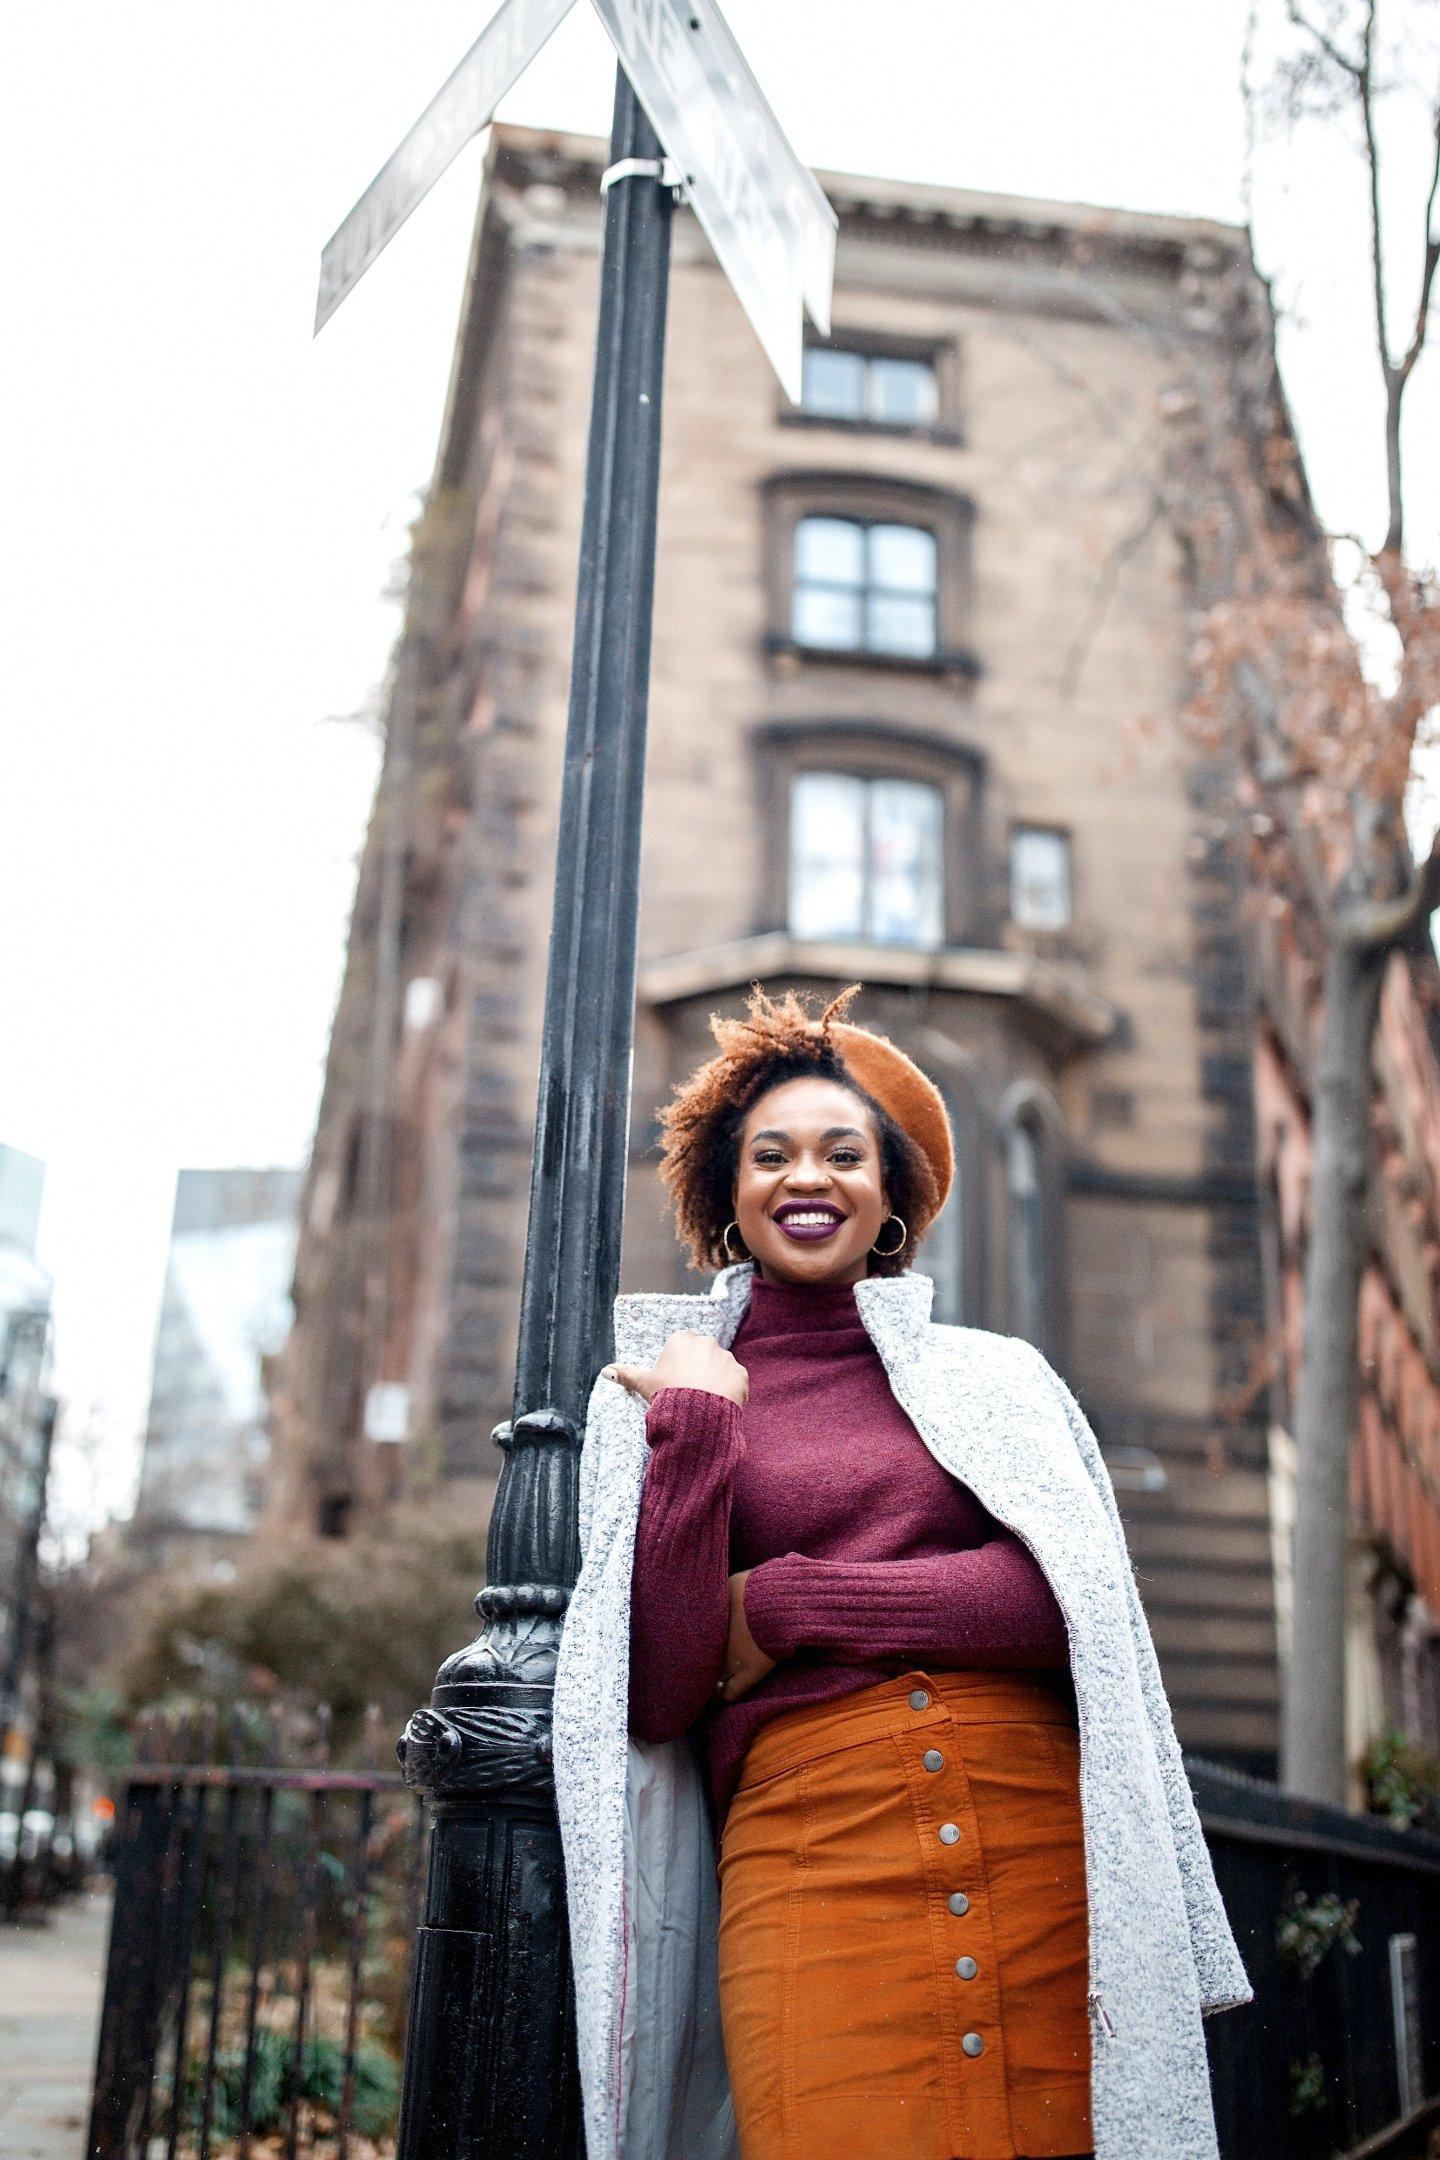 NYC Fashion Blogger Ijeoma Kola wearing Madewell Burgundy Turtleneck Mustard Skirt Leopard Loafers Beret and LOFT Grey Coat